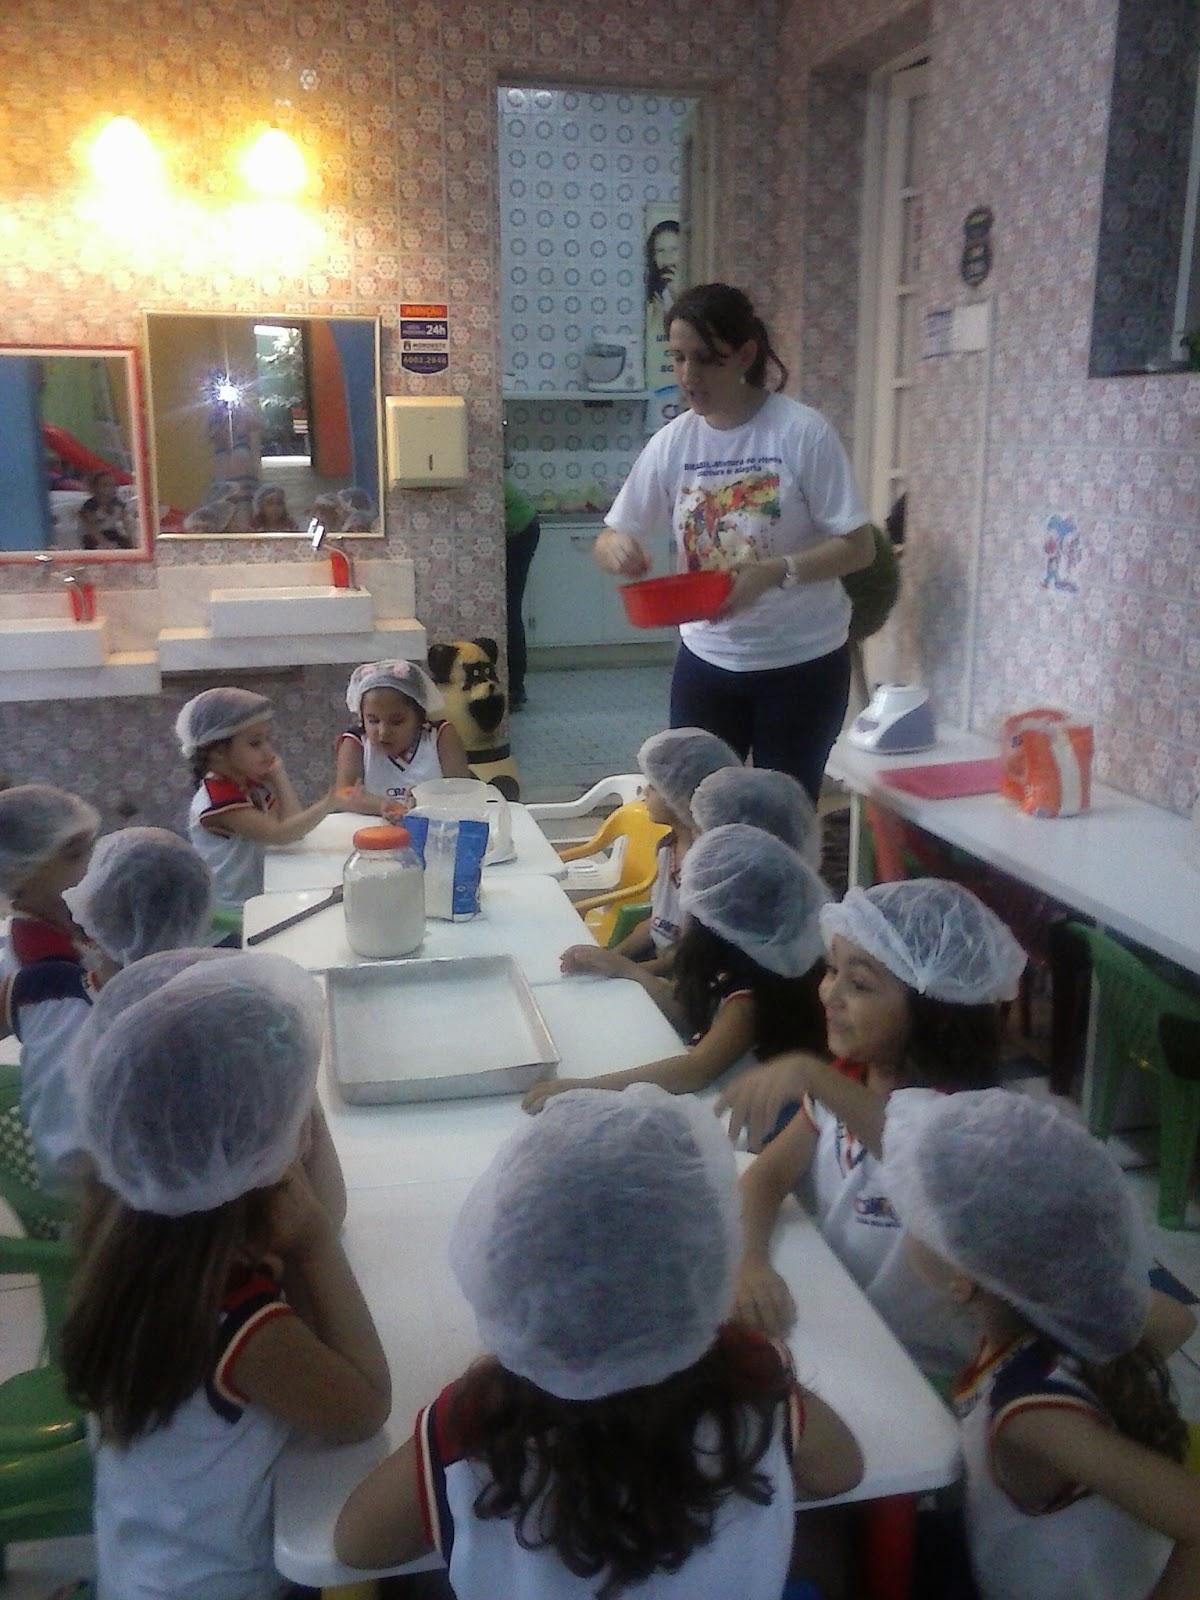 #AC7C1F COZINHA EXPERIMENTAL PÁSCOA 1200x1600 px Projeto Cozinha Experimental Na Escola #2535 imagens